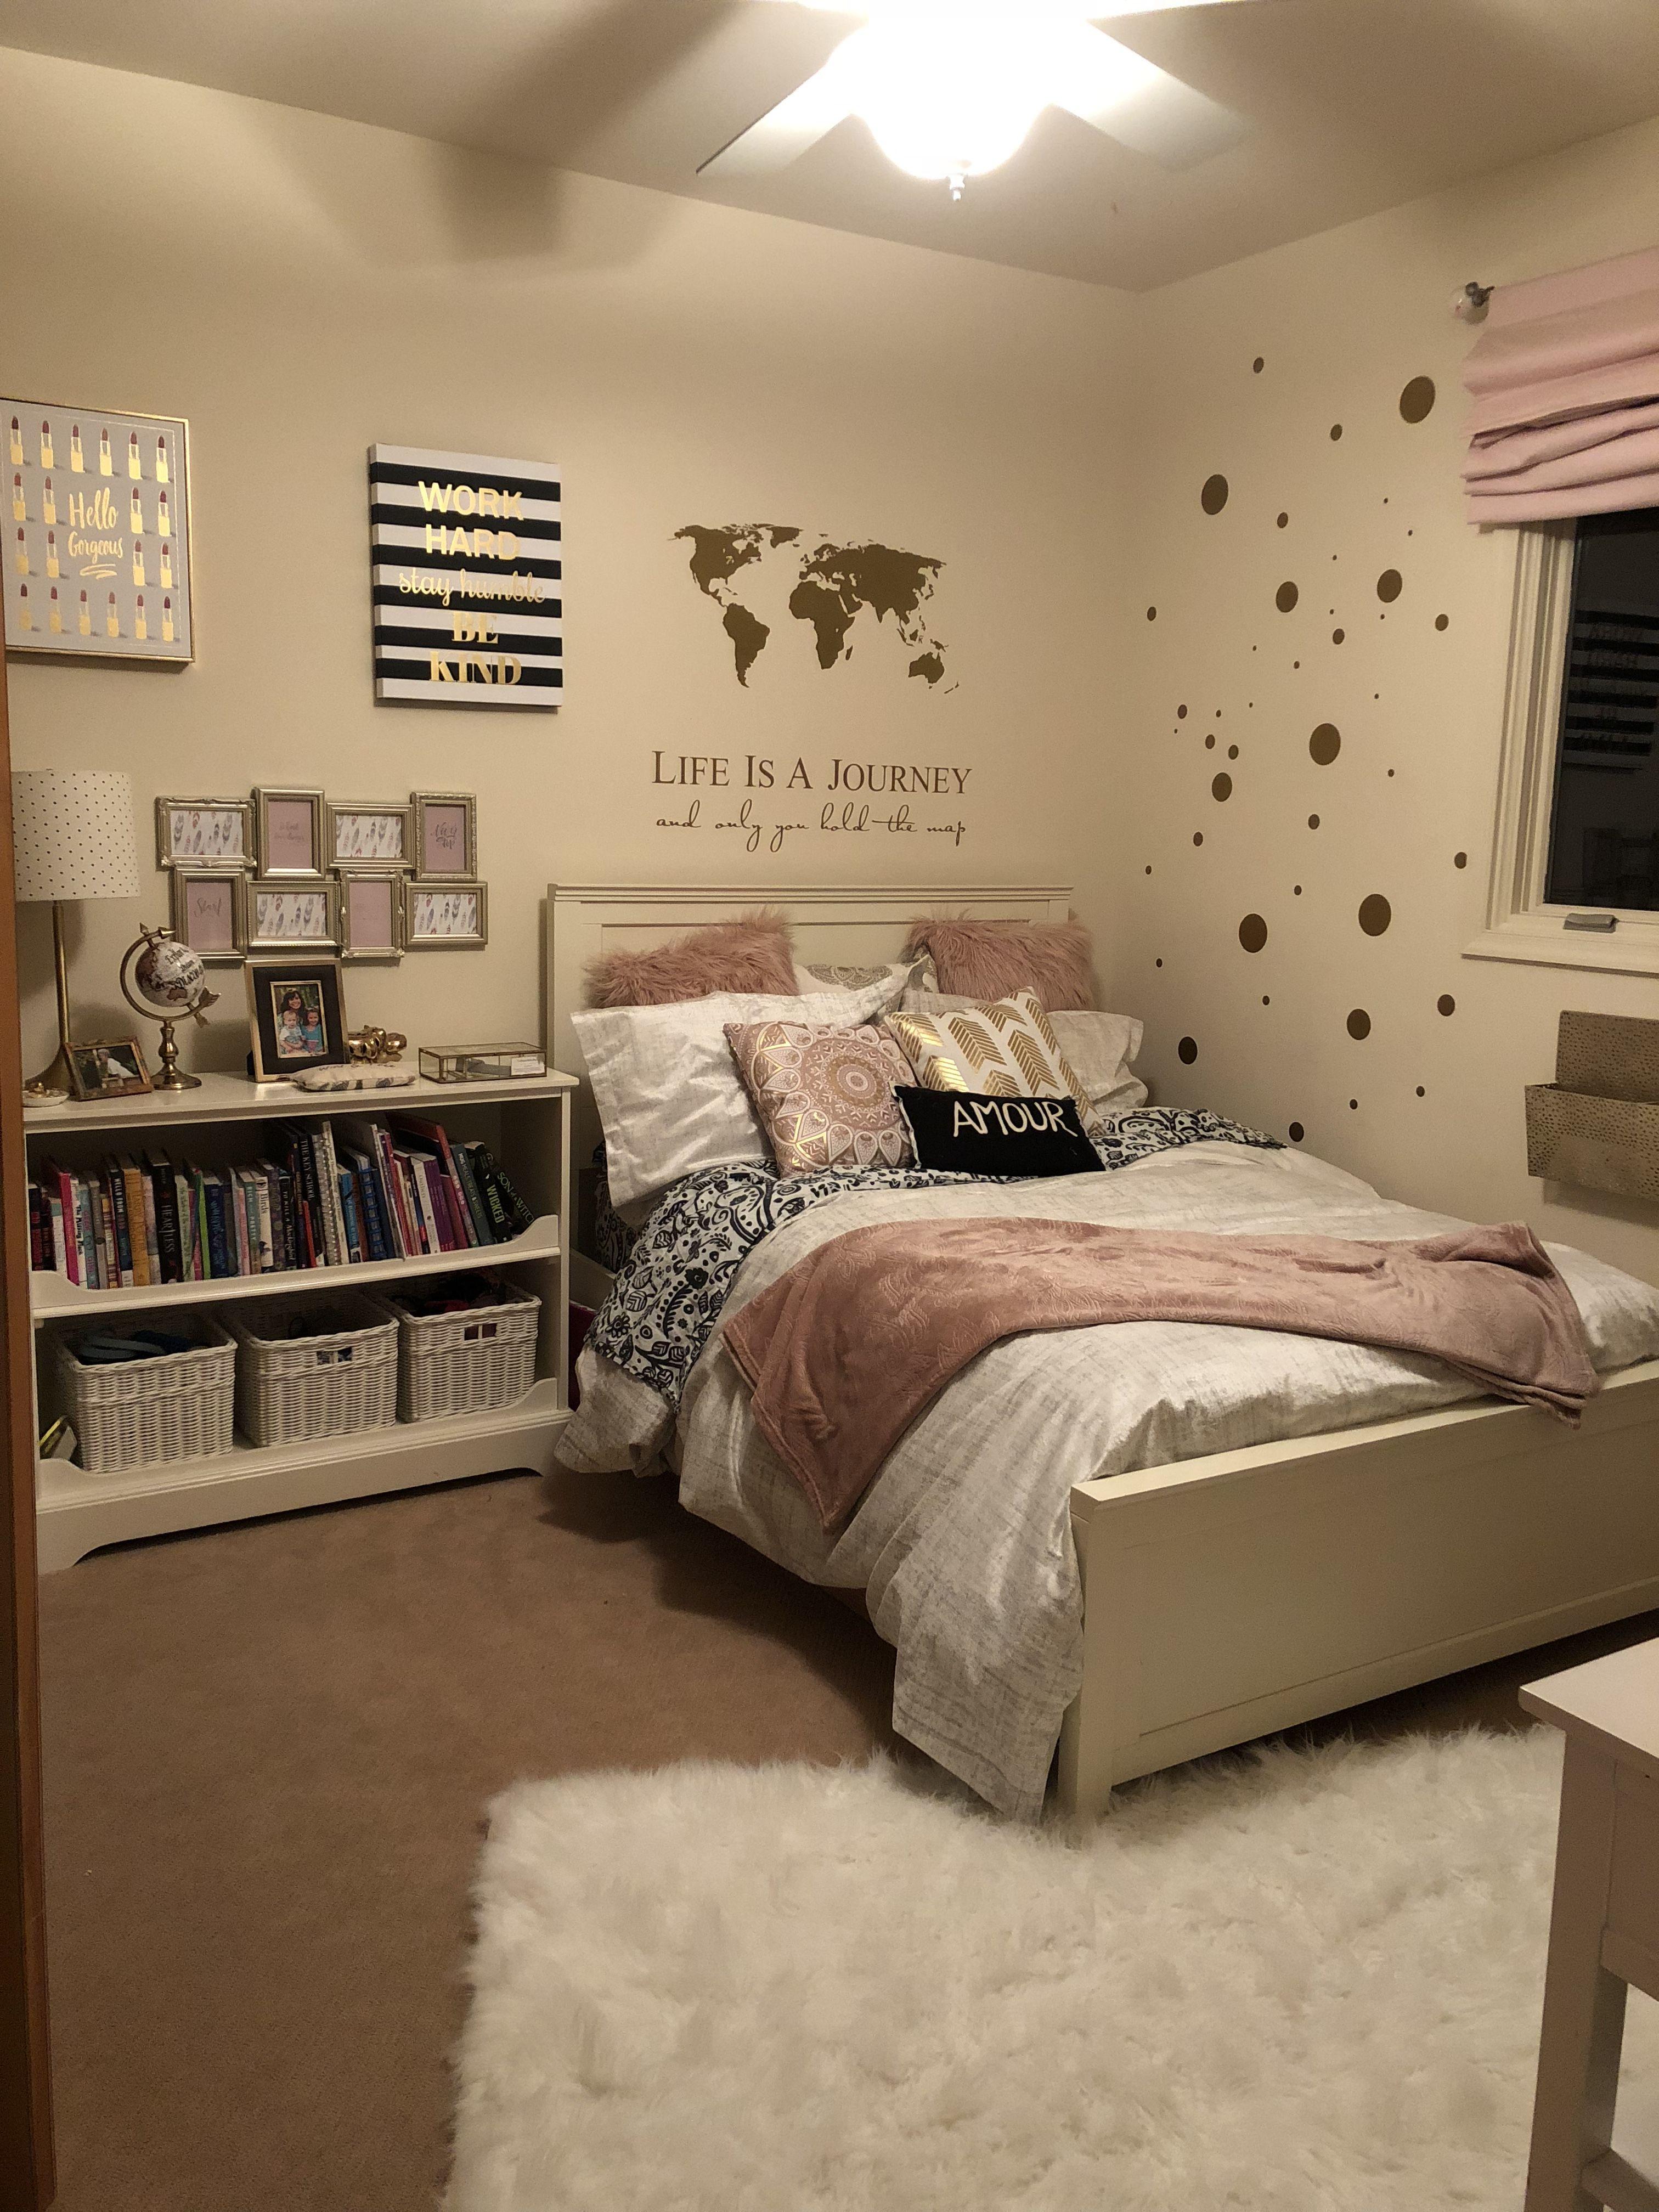 Pin By Aliceanne Loftus On Roo S Room Bedroom Decor Girls Dorm Room